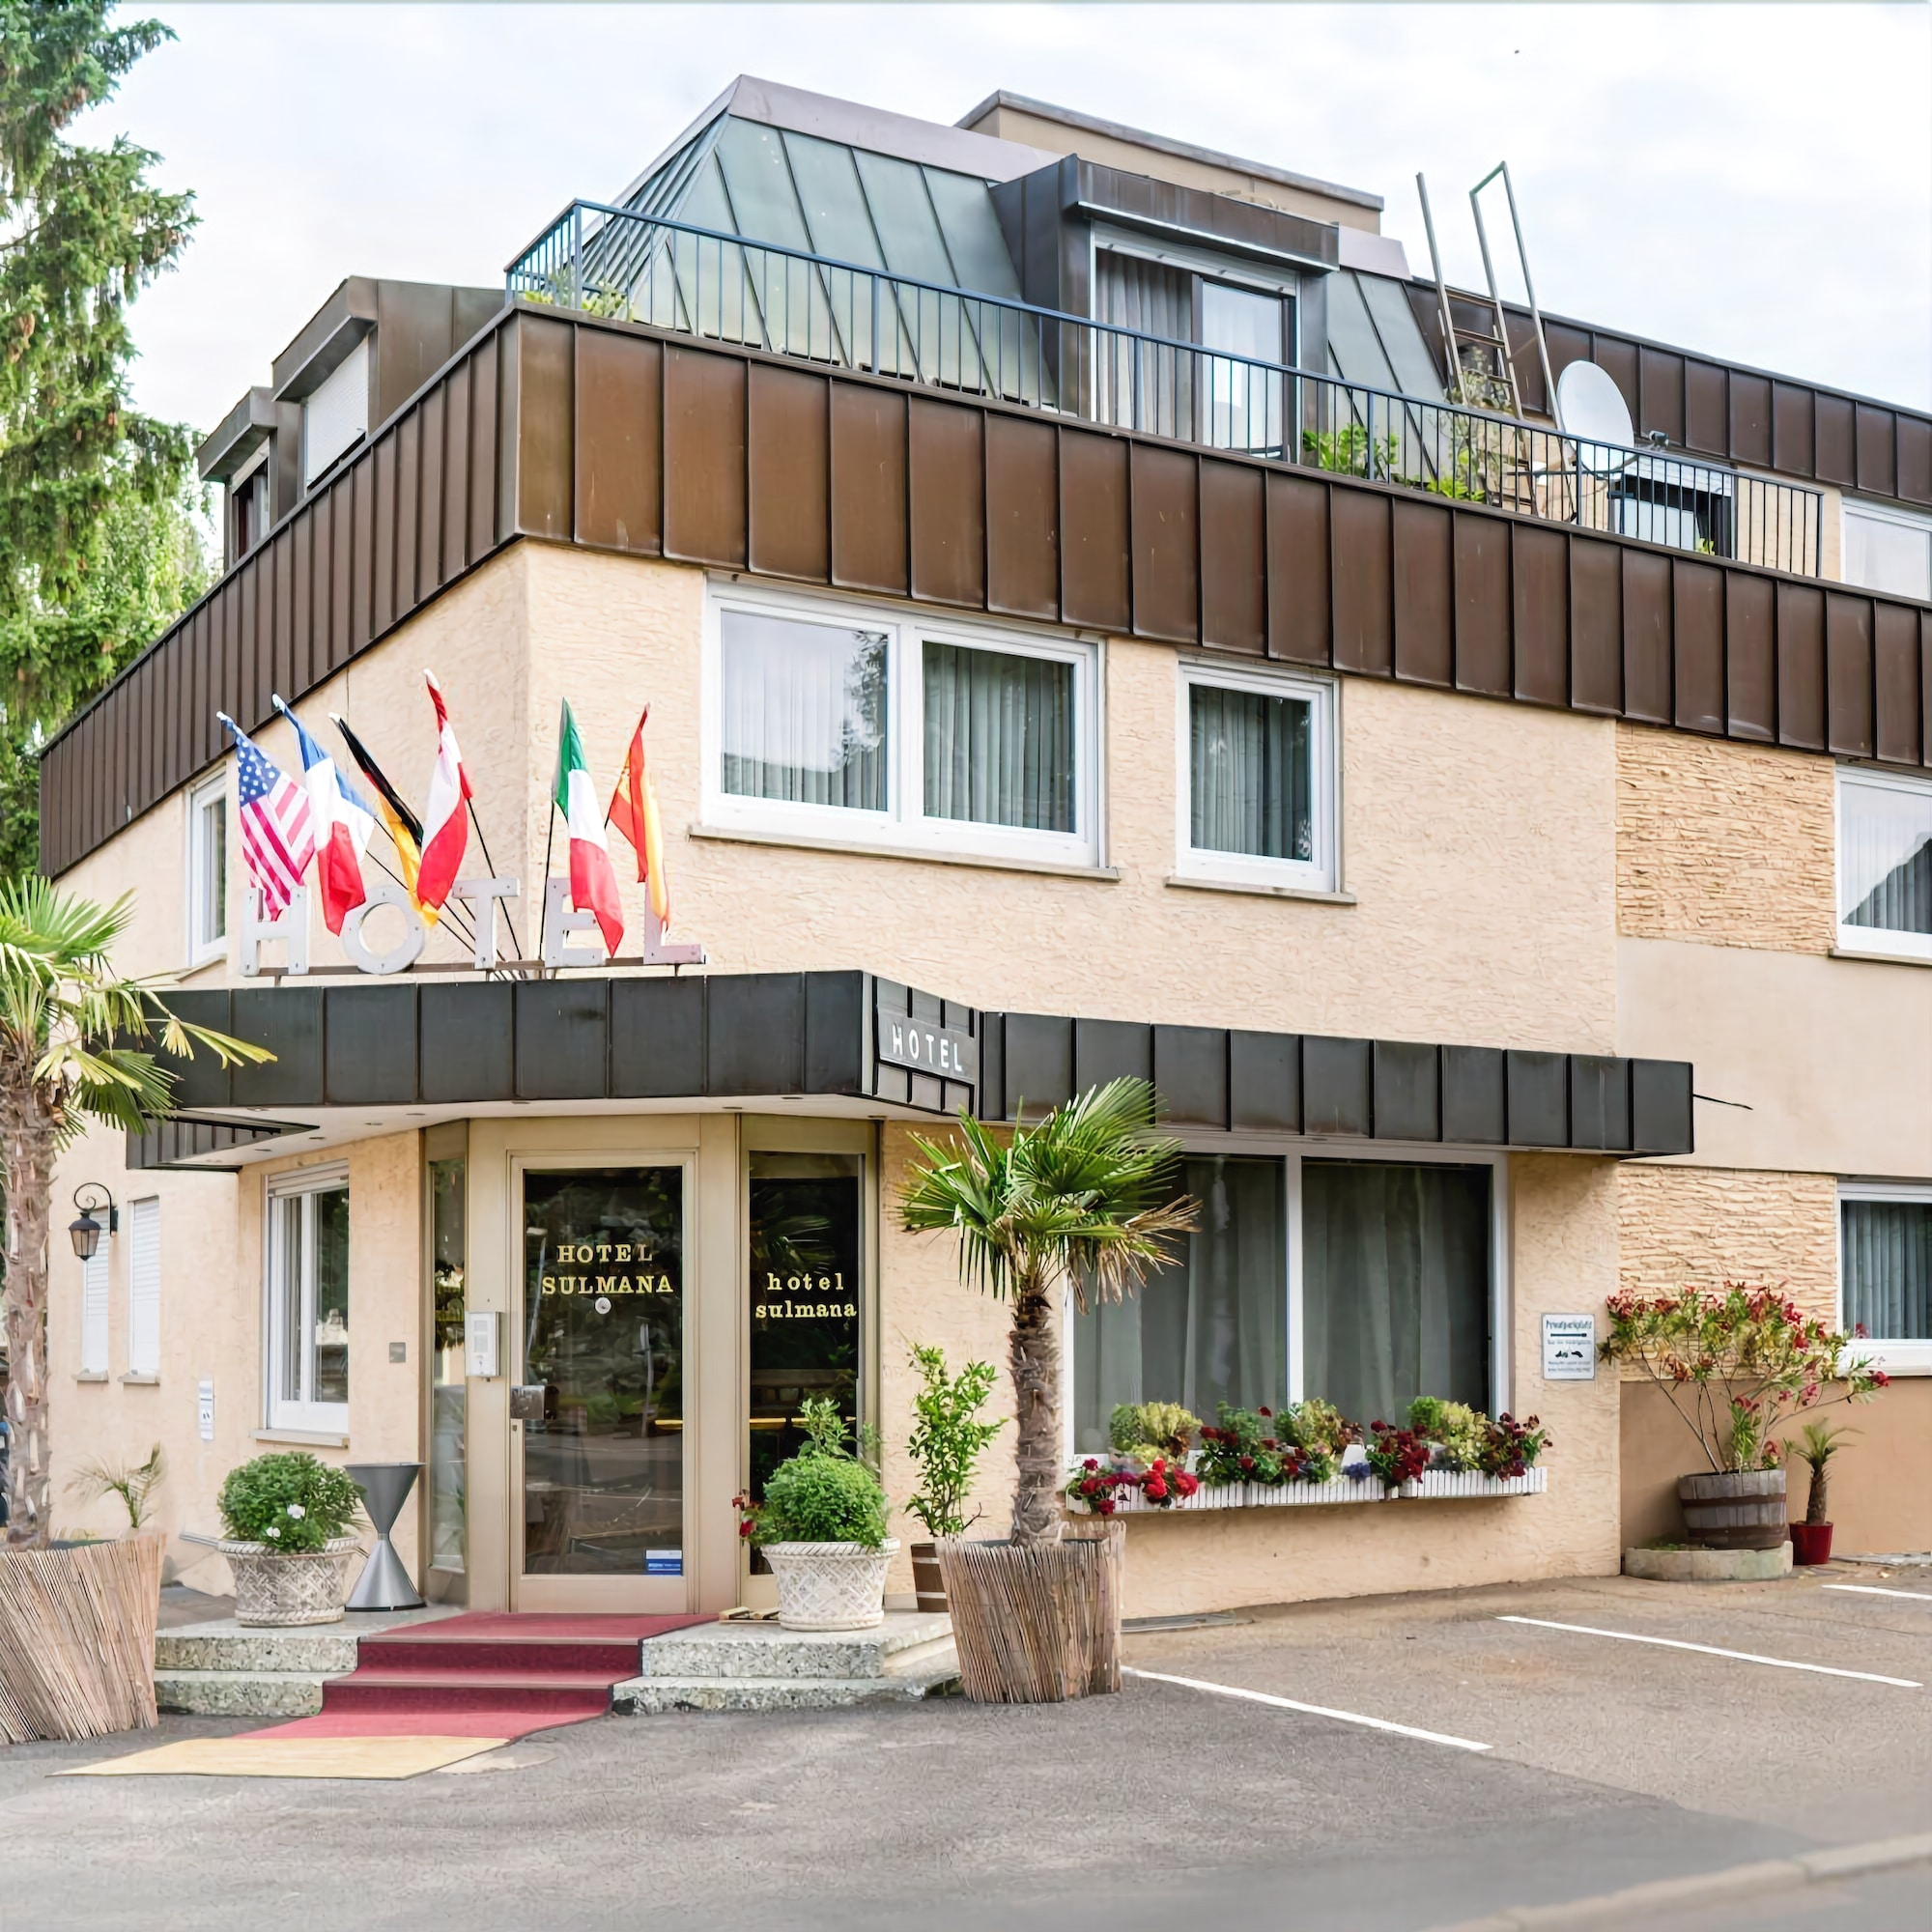 Hotel Villa Sulmana, Heilbronn